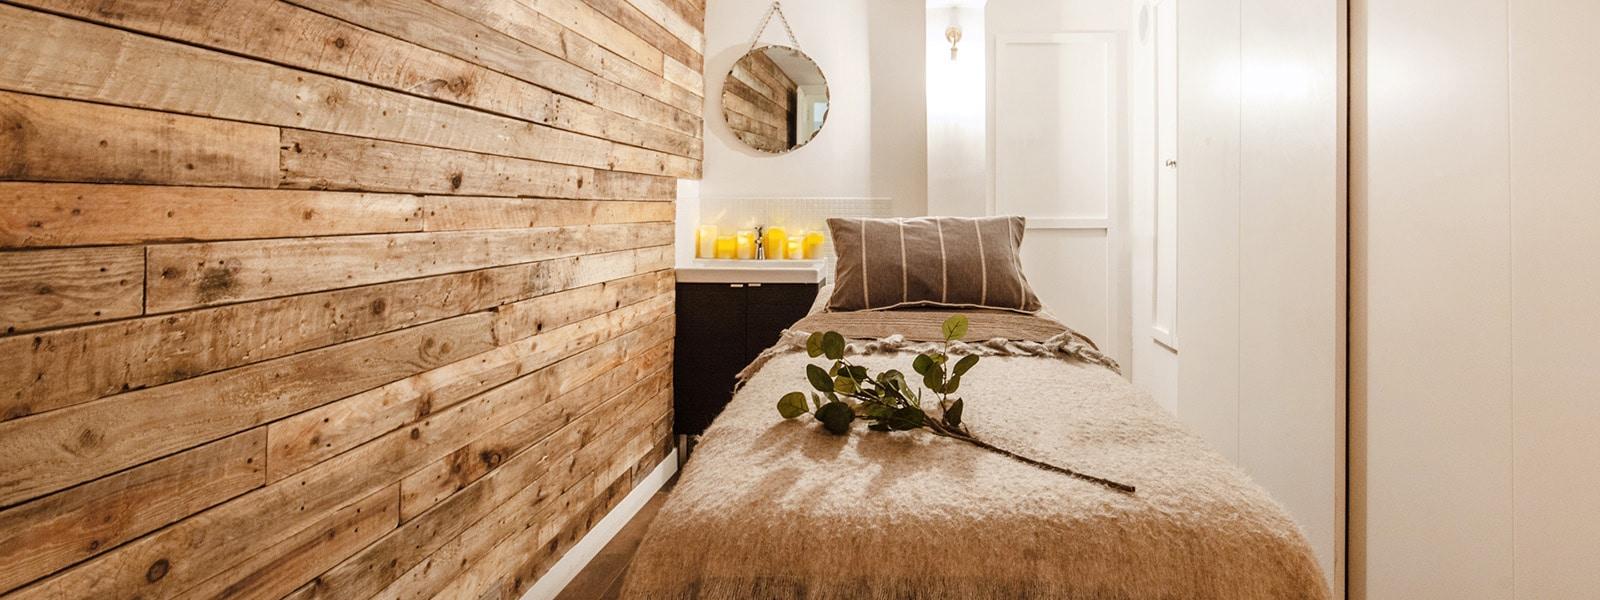 Massage treatments in Greenwich